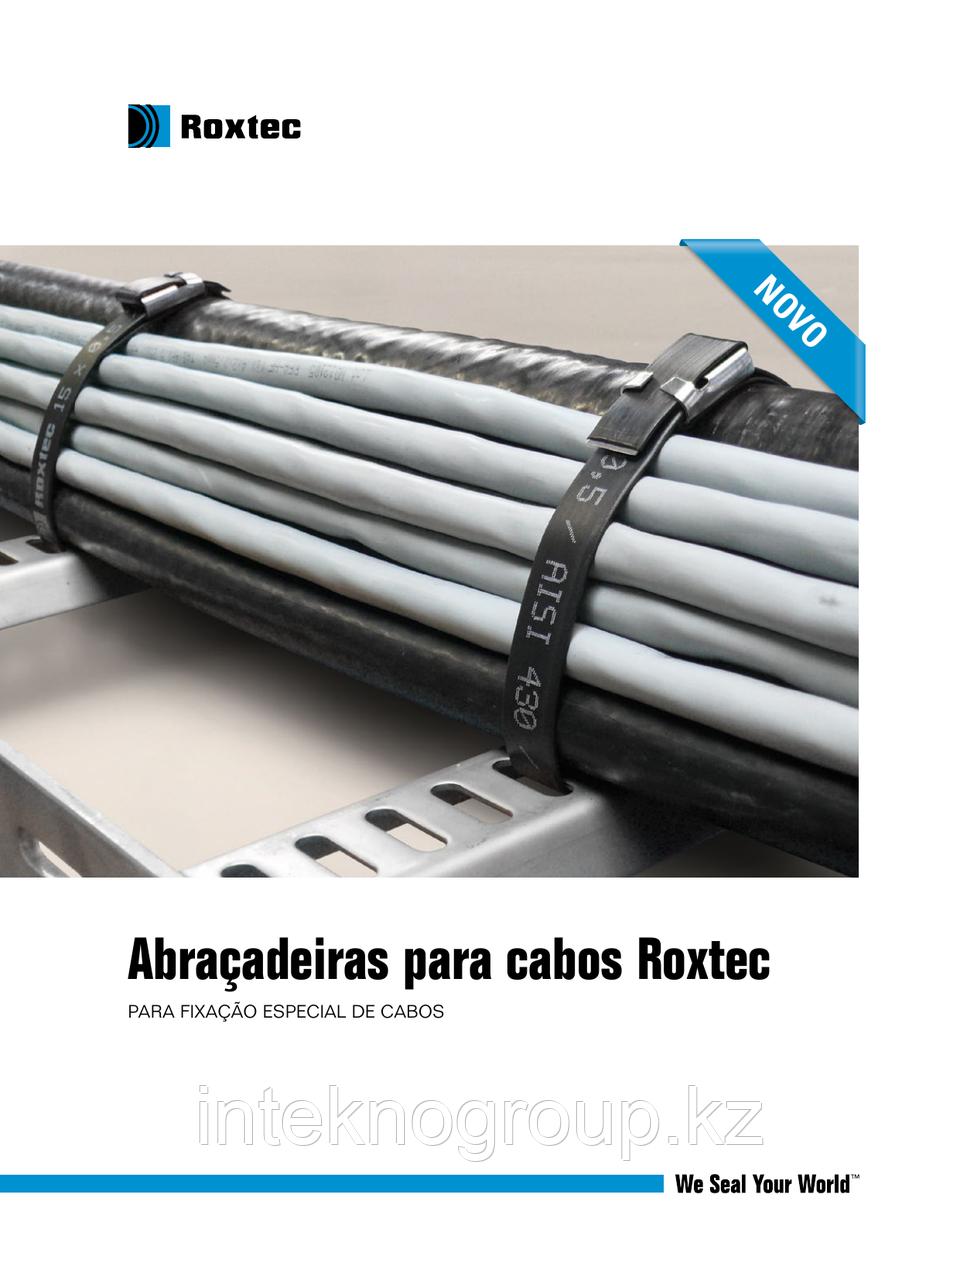 Roxtec Cable straps Strap 08x0,3 black/ss. L=500 mm